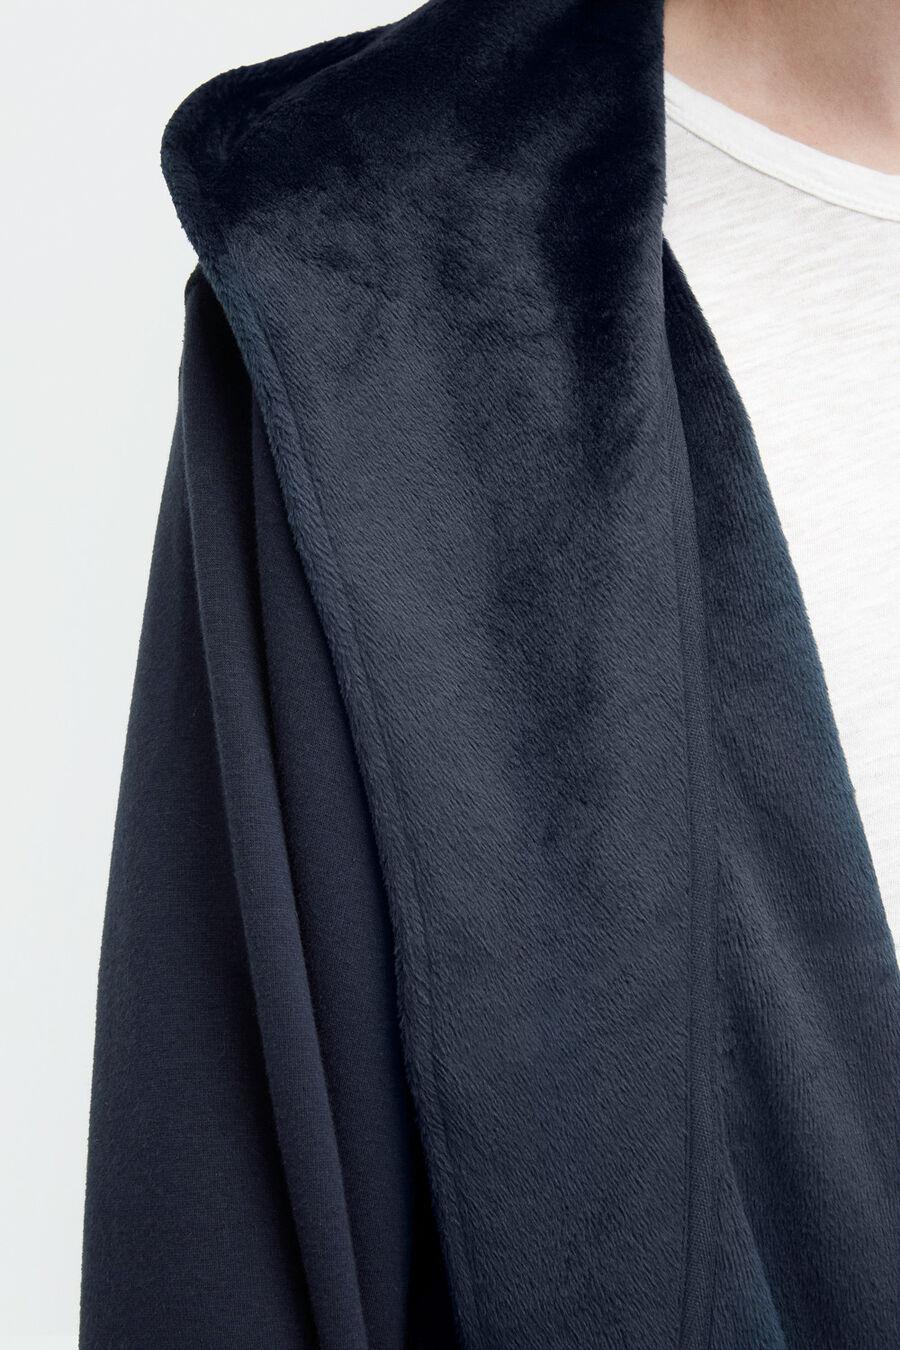 Brunswick Robe - Image 2 of 4